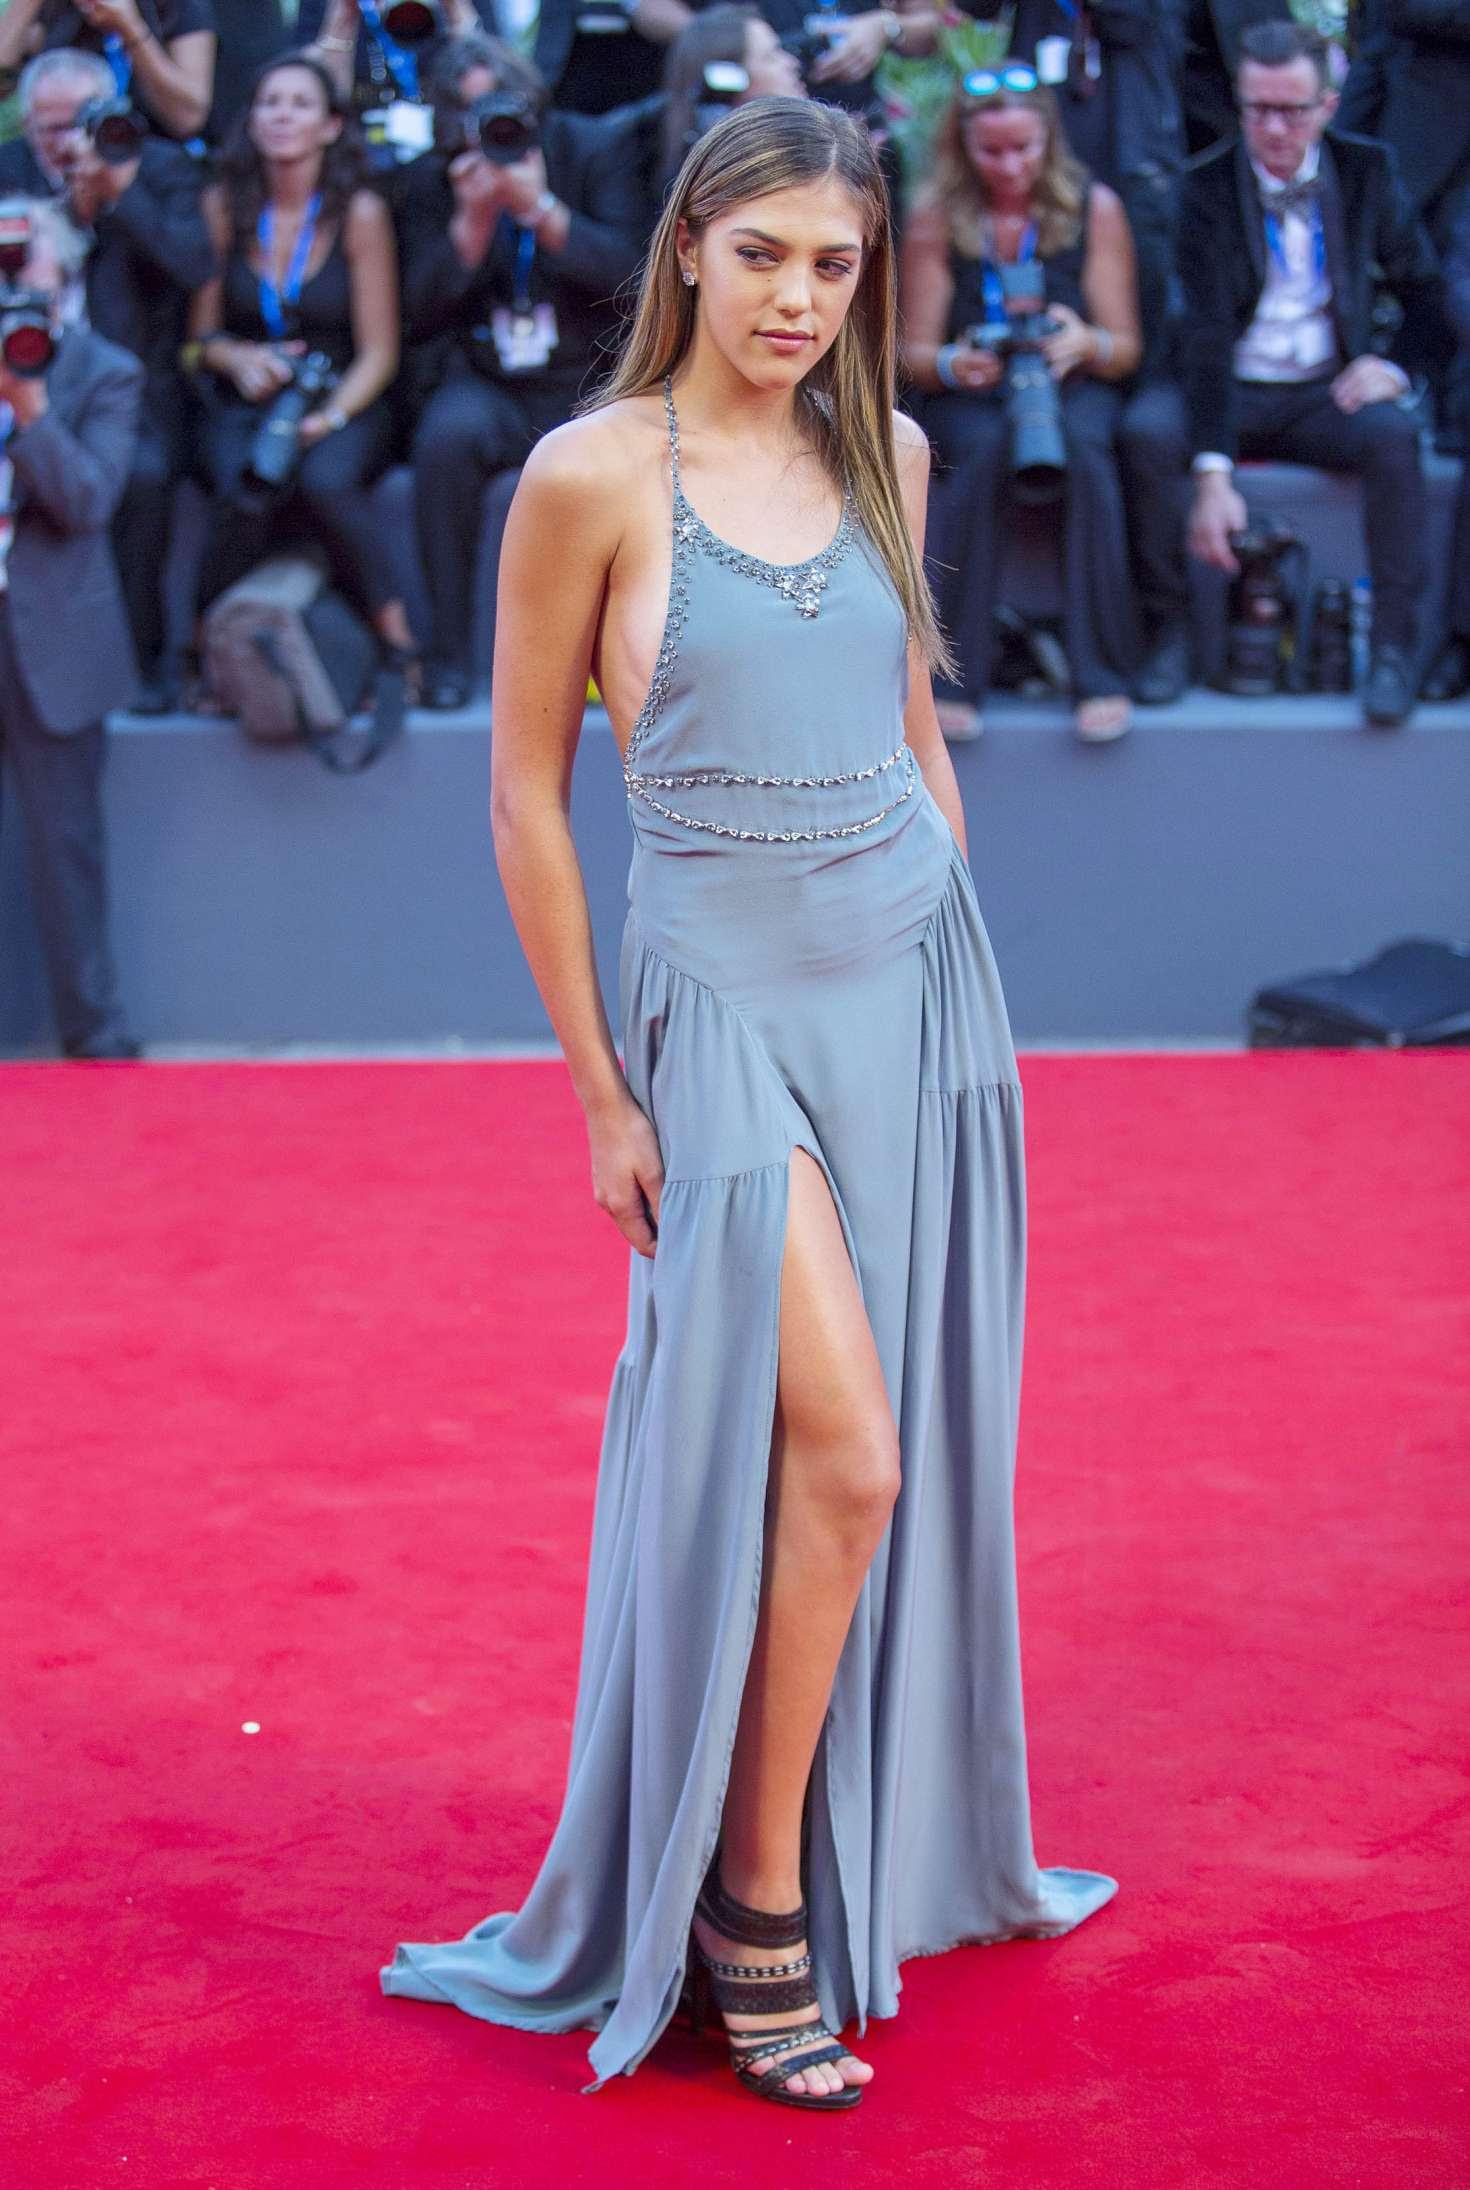 Sistine Rose Stallone – 'Hacksaw Ridge' Premiere at 73rd Venice Film Festival in Italy